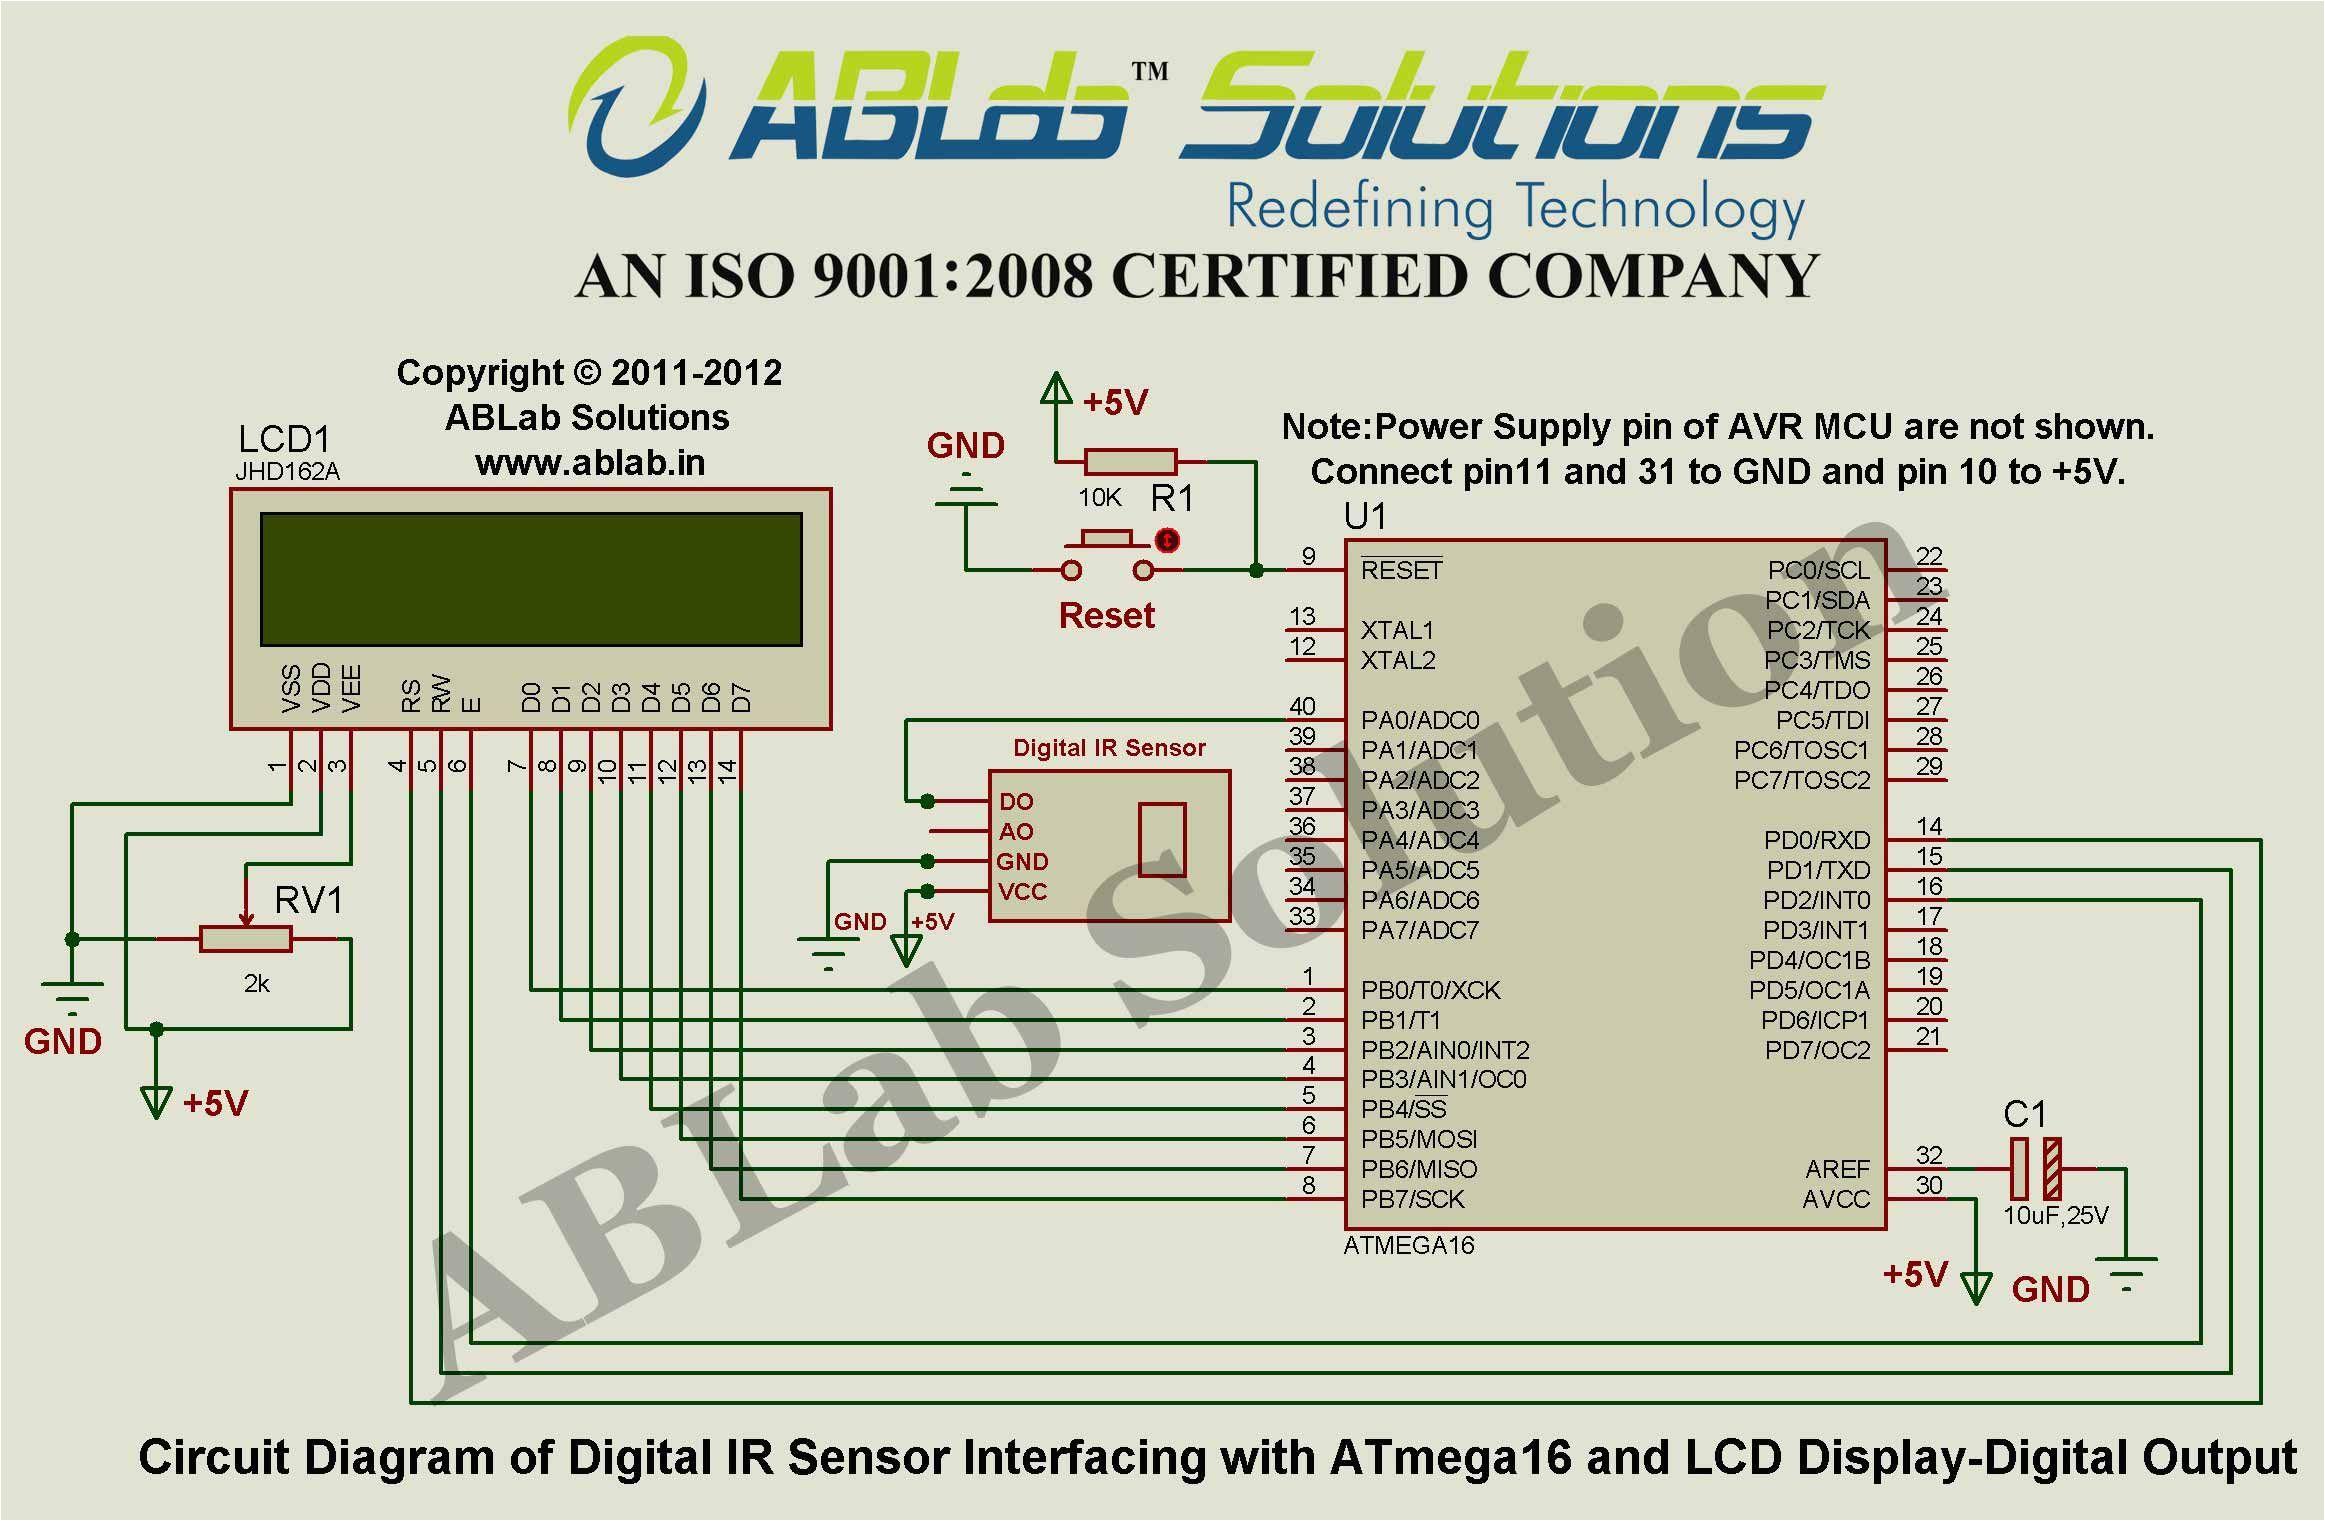 digital ir sensor interfacing with avr atmega16 microcontroller and lcd display digital output circuit diagram ablab solutions